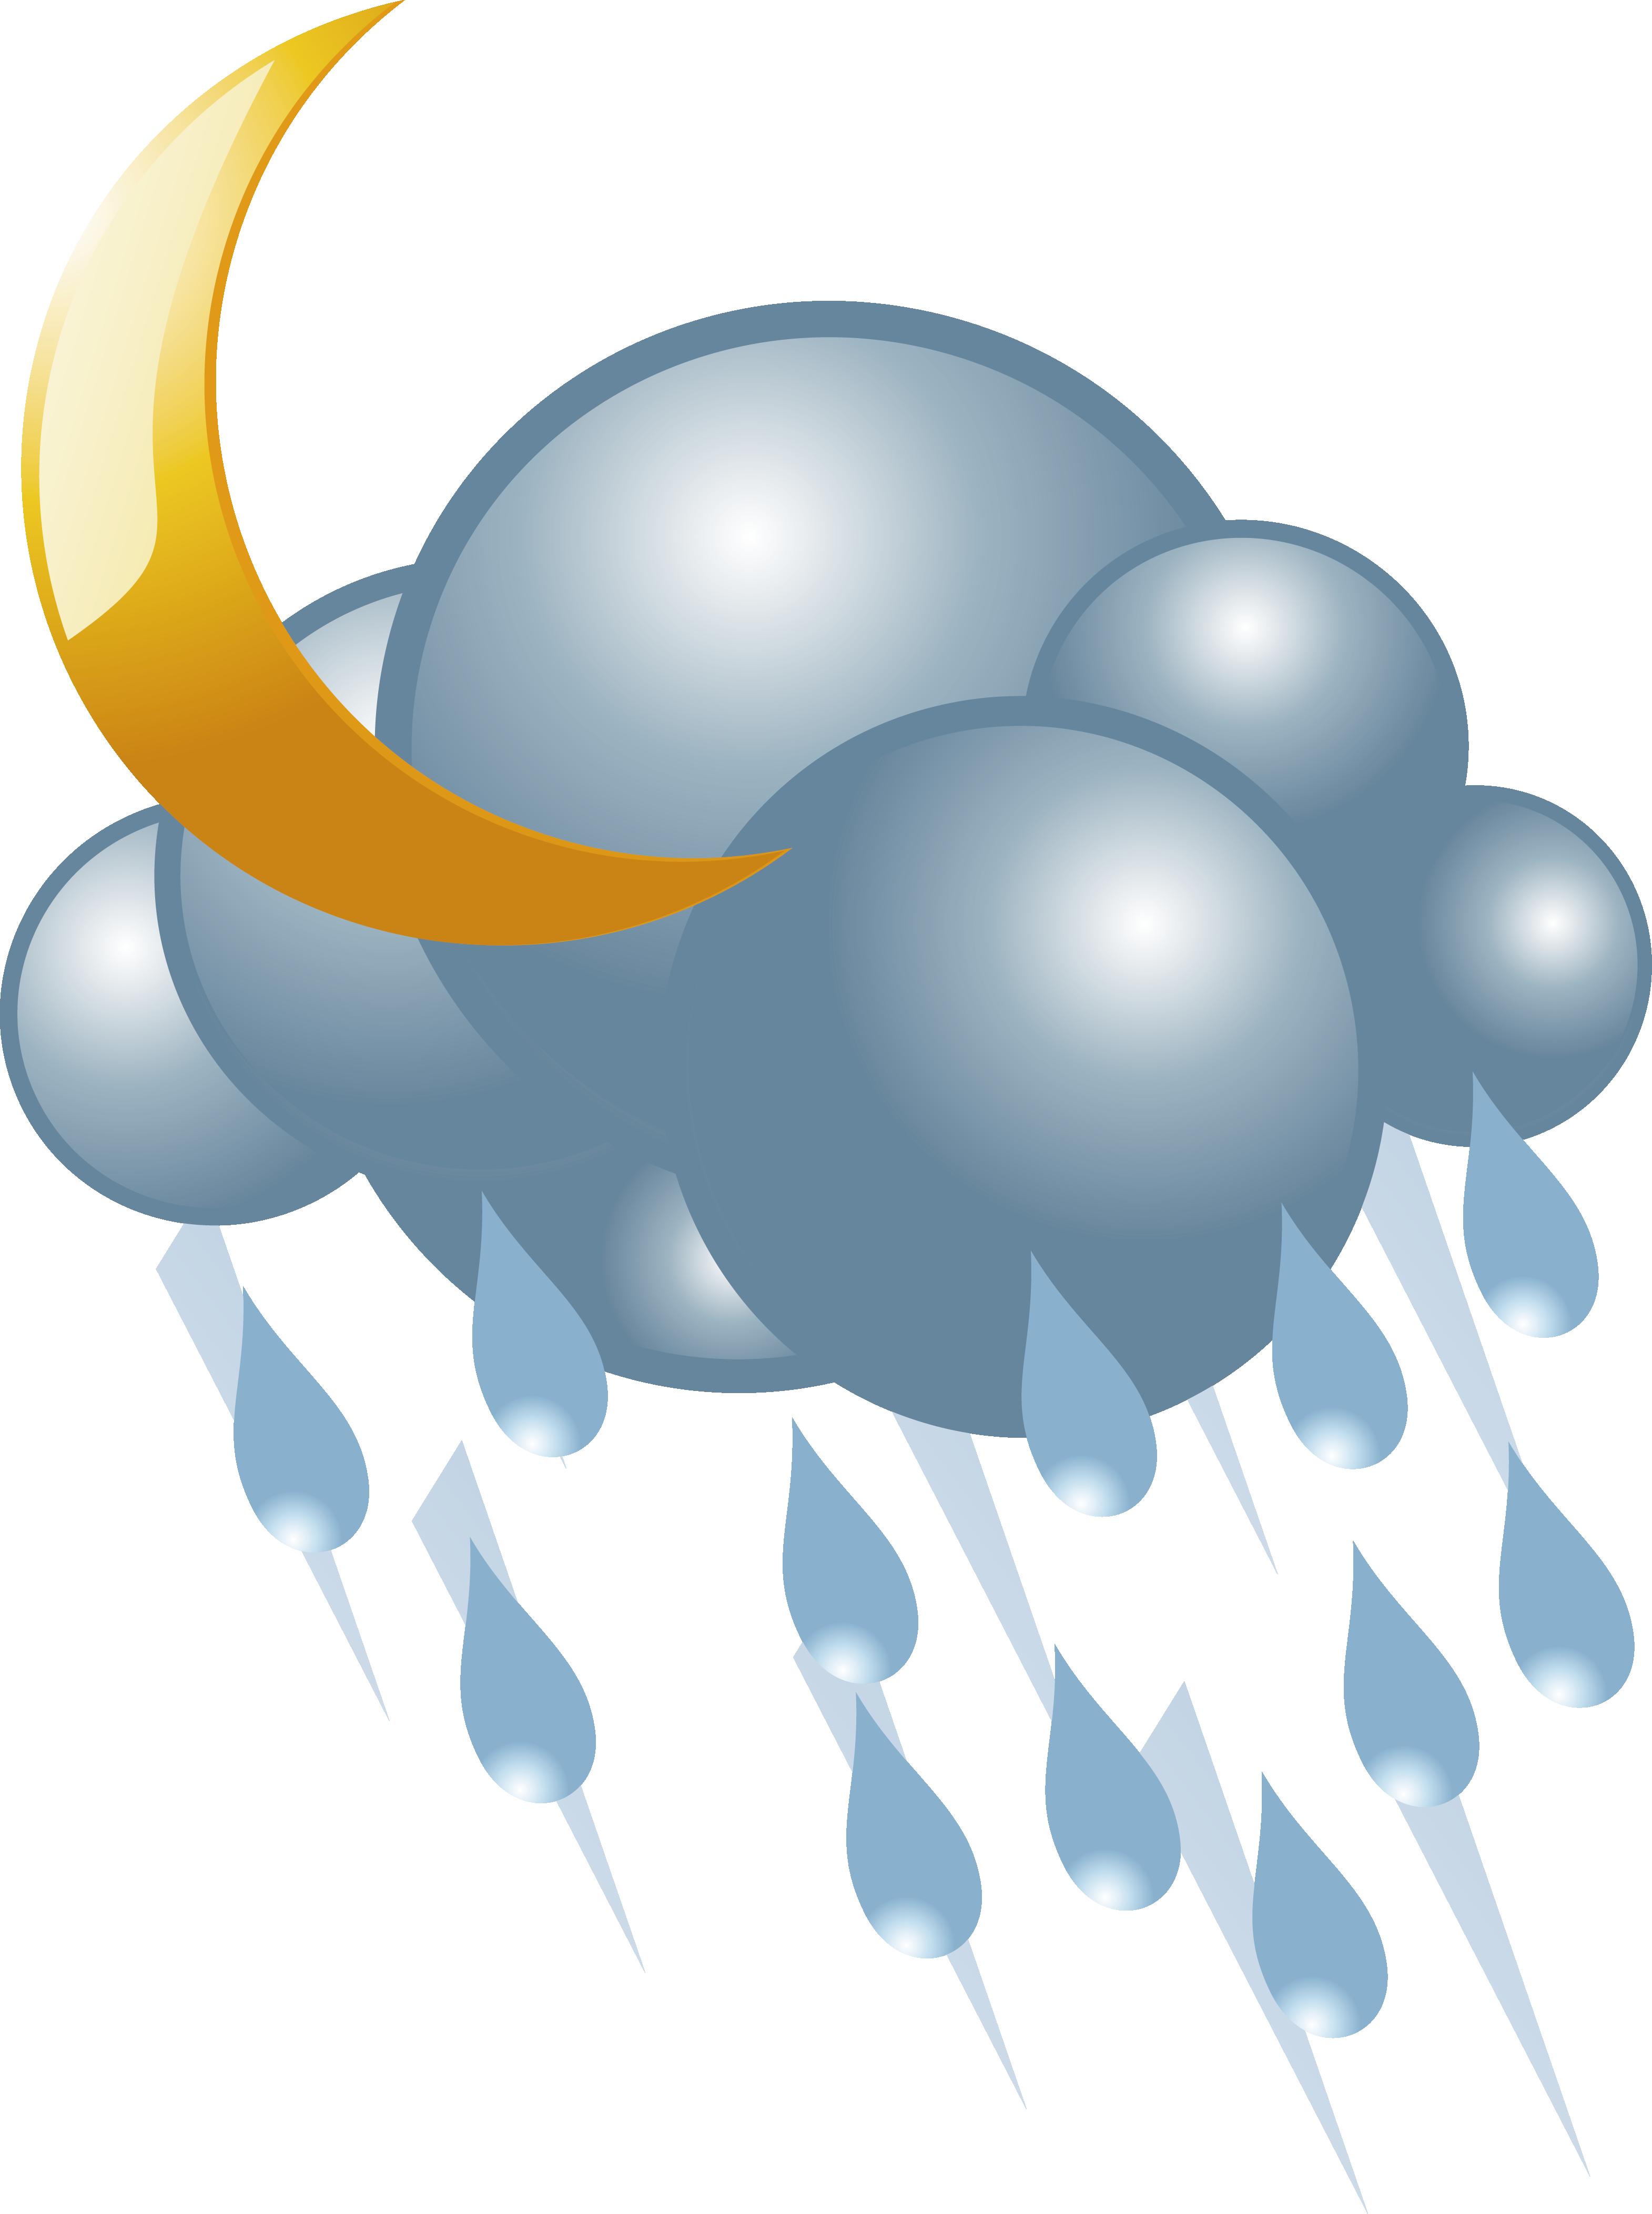 Cloudy clipart lightning cloud. Rain vector icon transprent